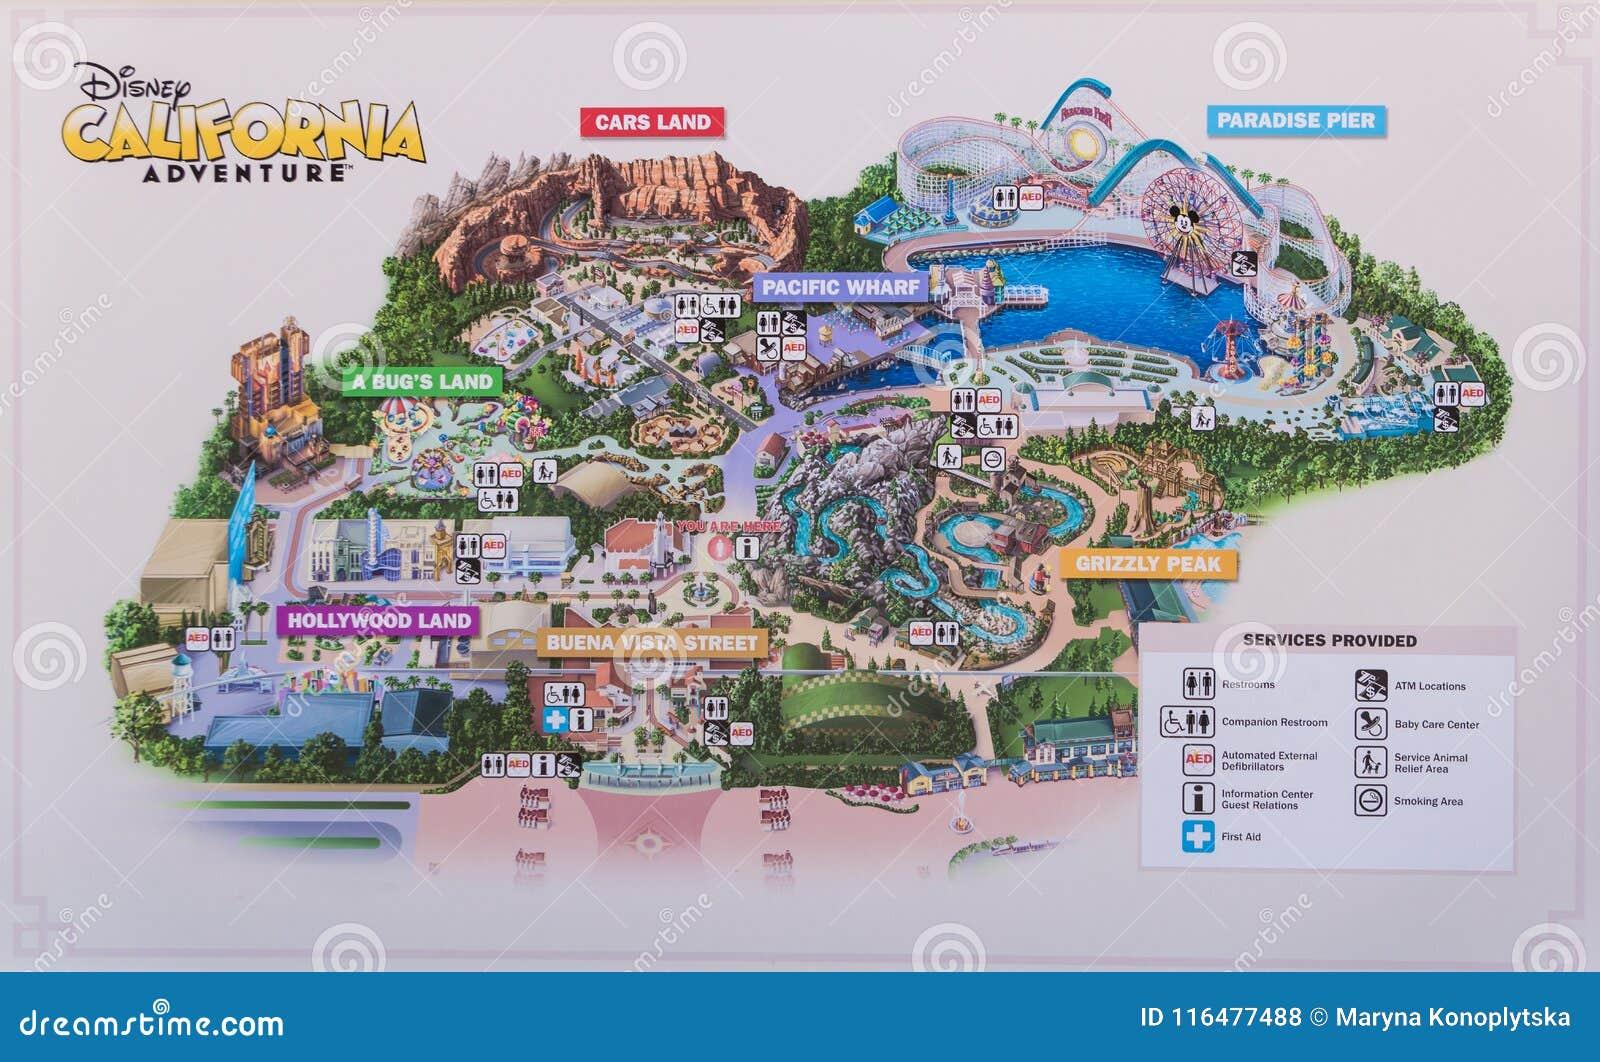 Map Of Disneyland, Anaheim, Los Angeles. Summer Holidays In